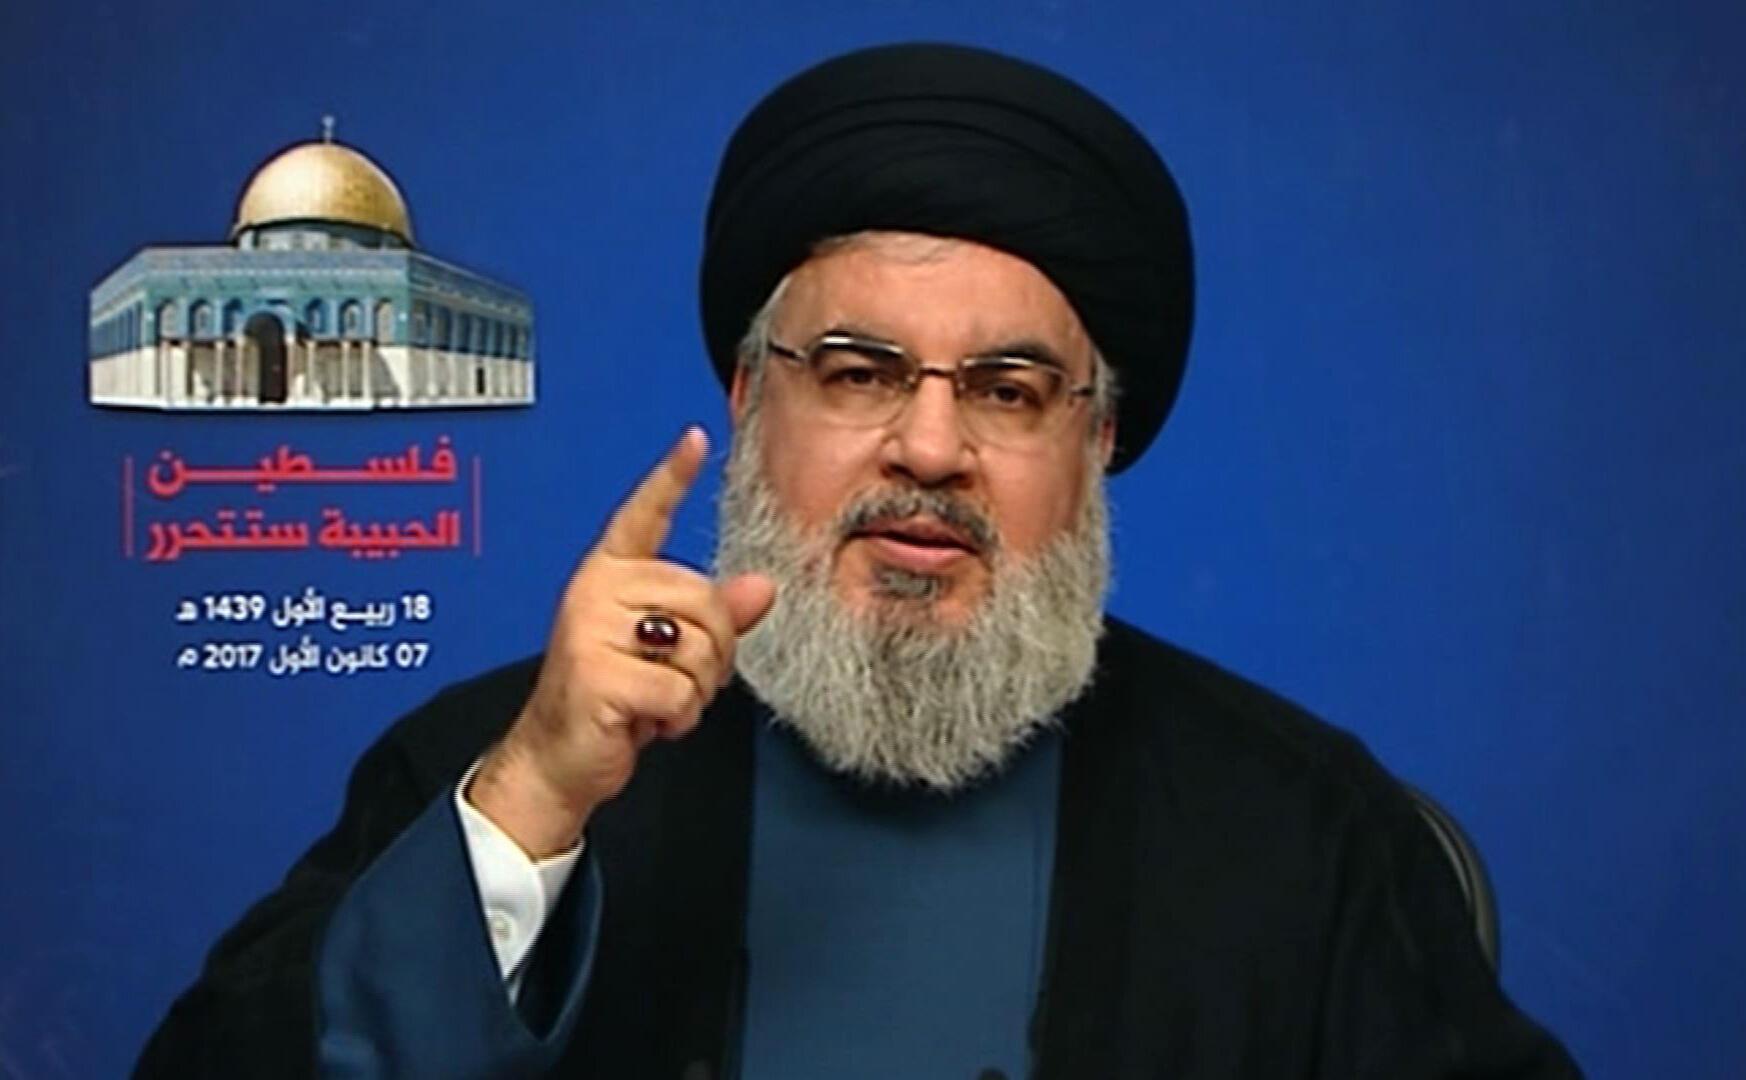 Hassan Nasrallah, kiongozi wa kundi la Hezbollah, Lebanon, Desemba 7, 2017.